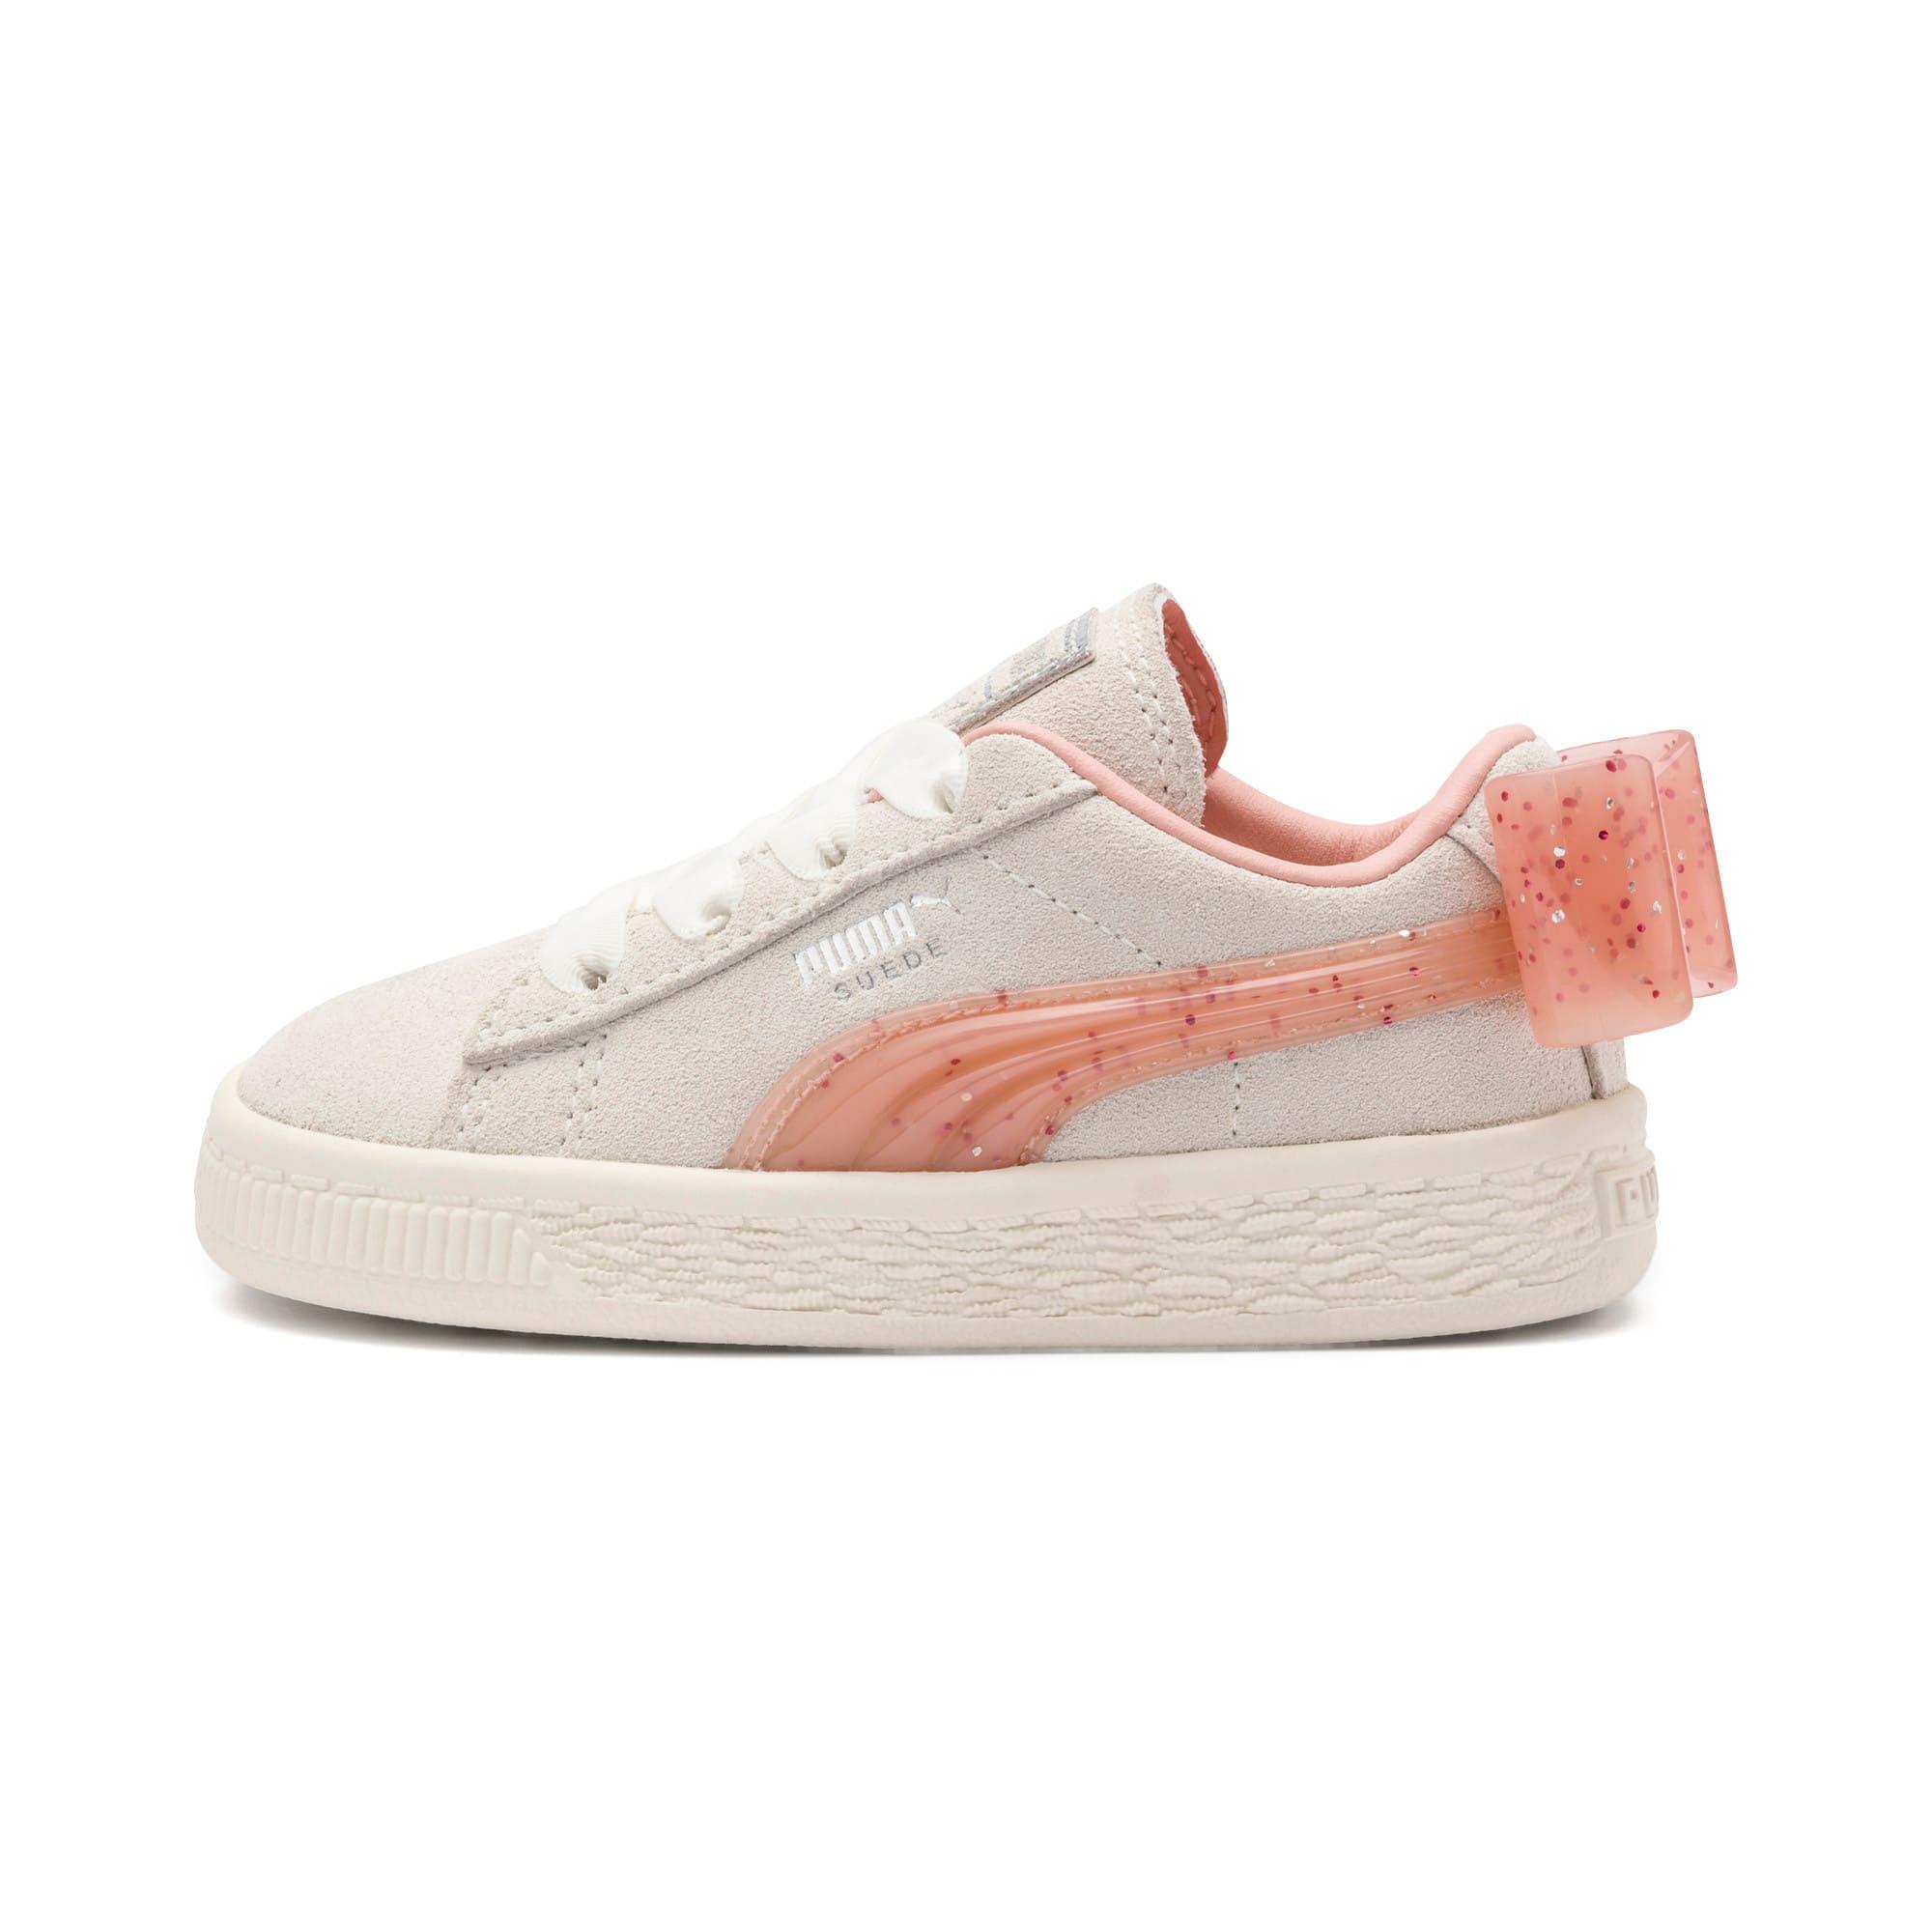 Miniatura 1 de Zapatos Suede Jelly Bow AC para bebé, White-Peach Bud-Silver, mediano